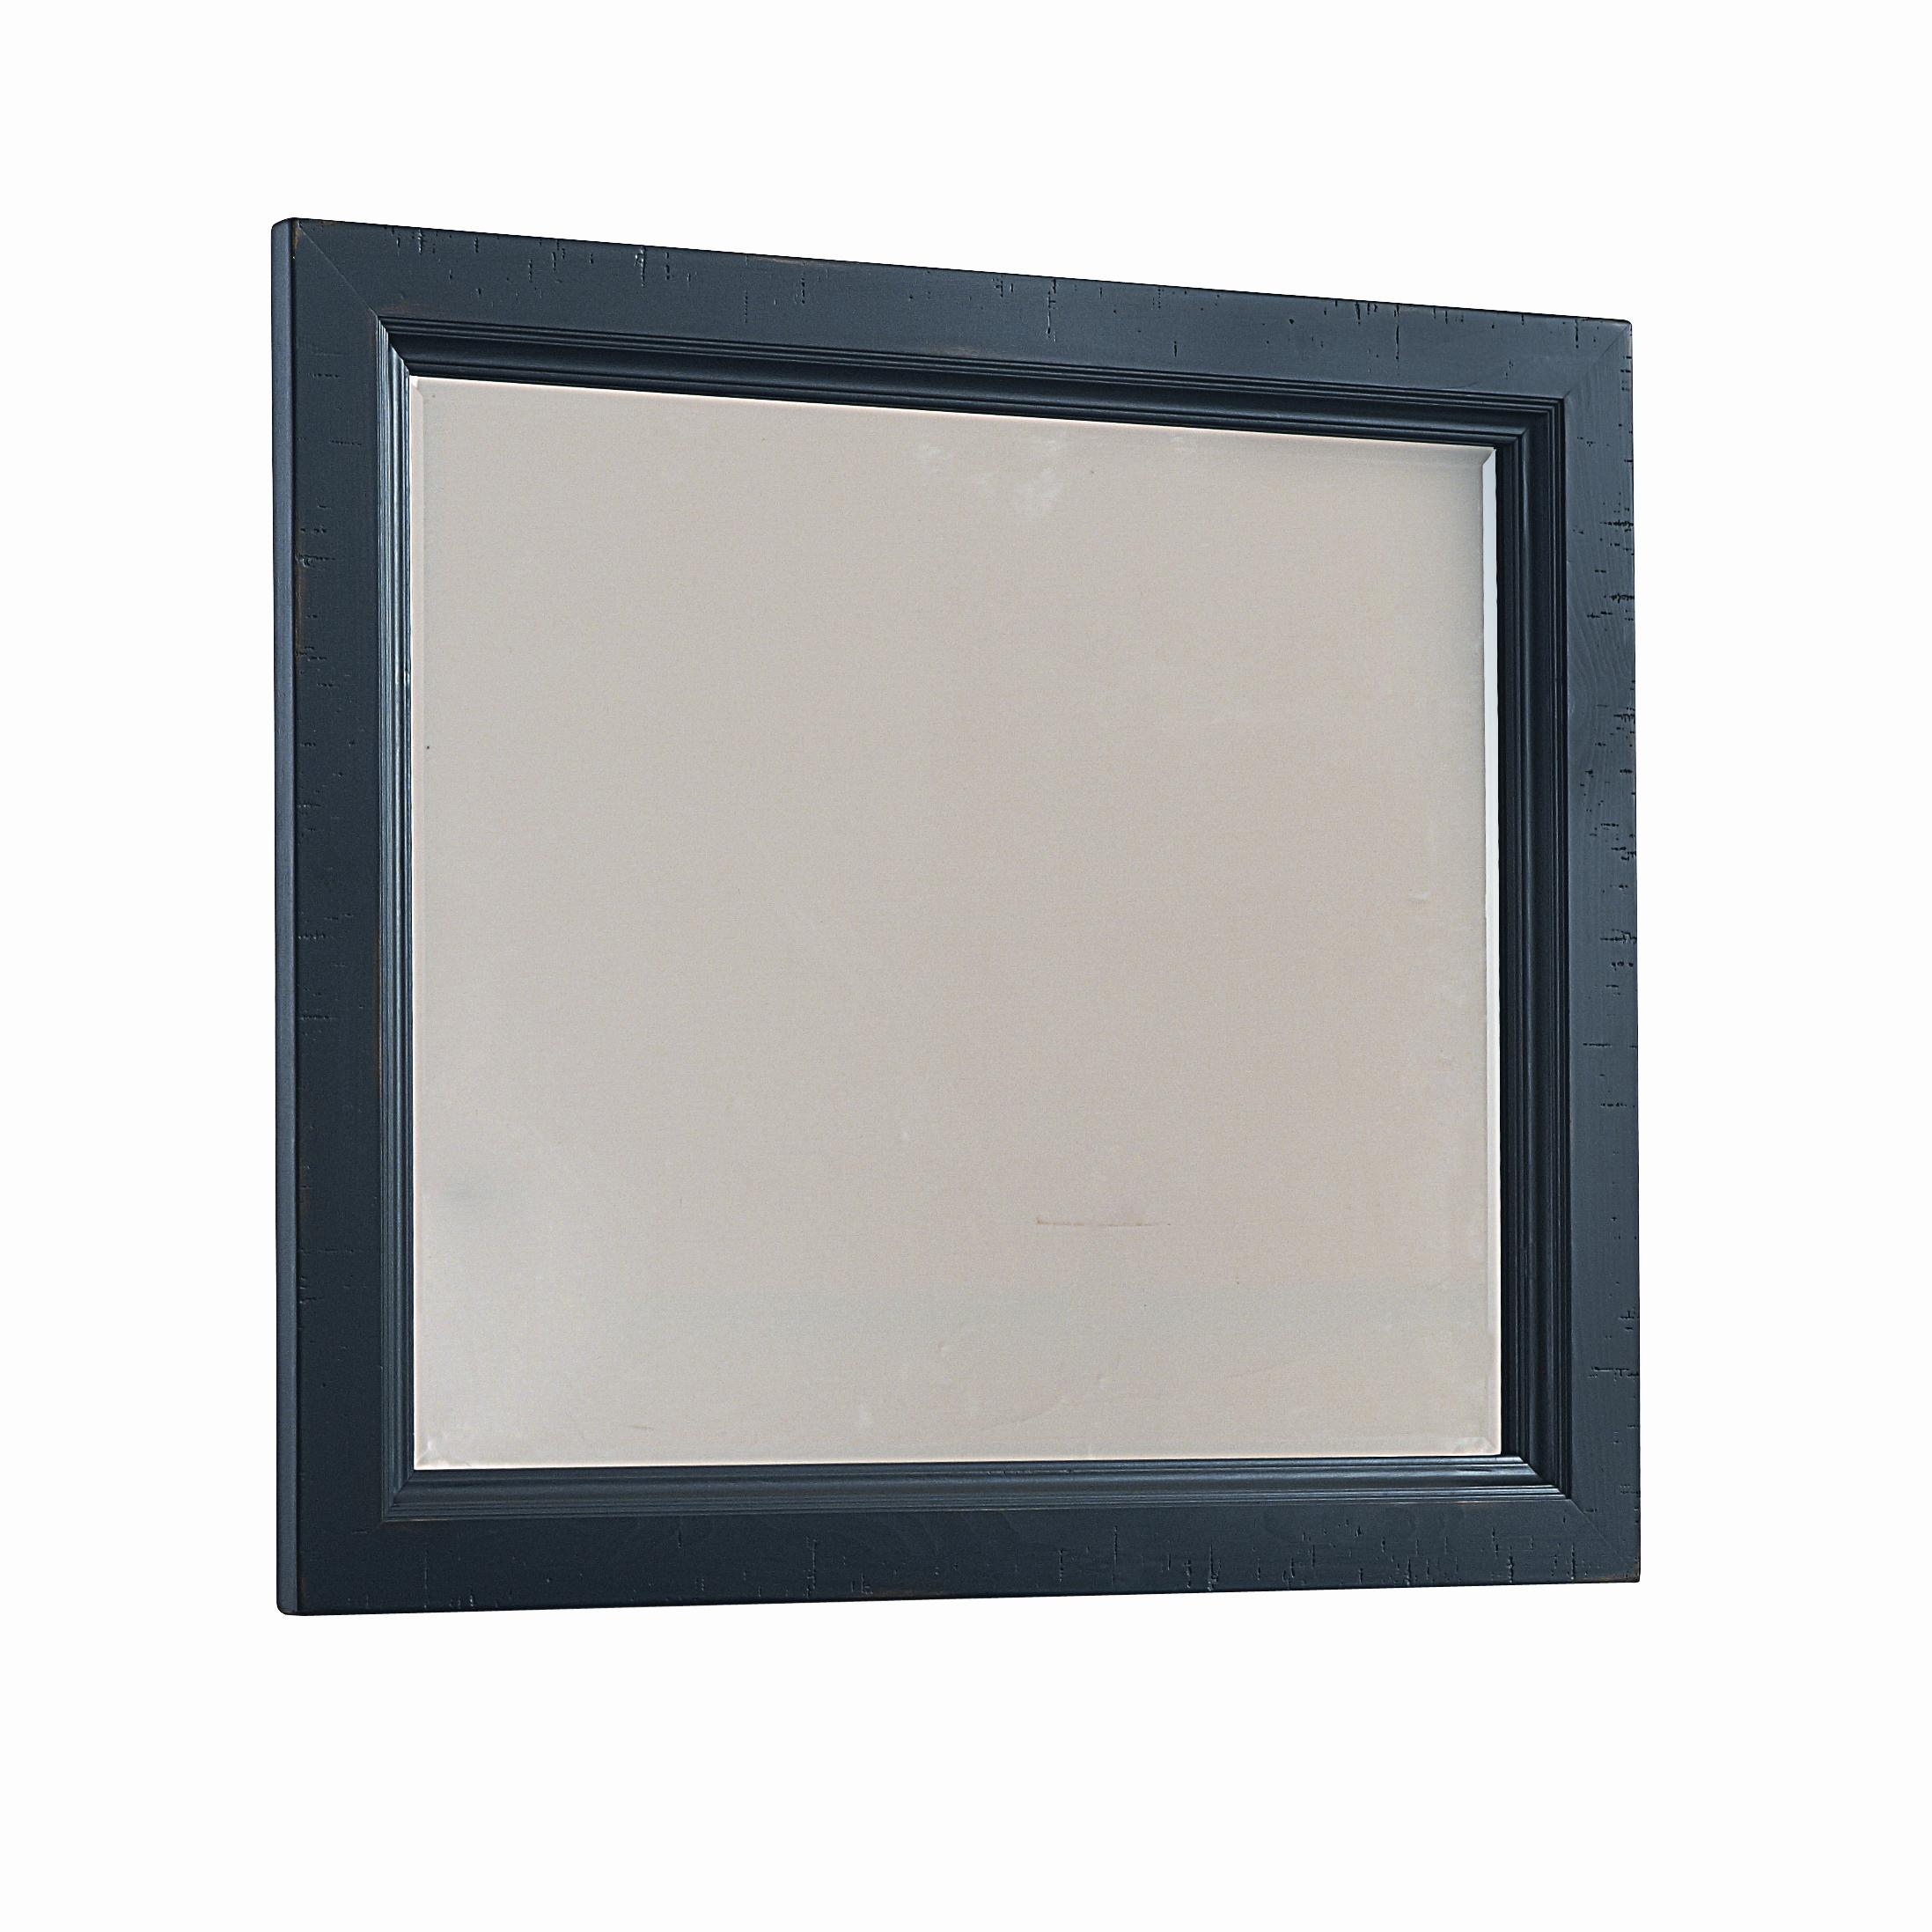 Vaughan Bassett Timber Mill Chesser Mirror - bevel glass - Item Number: BB56-446